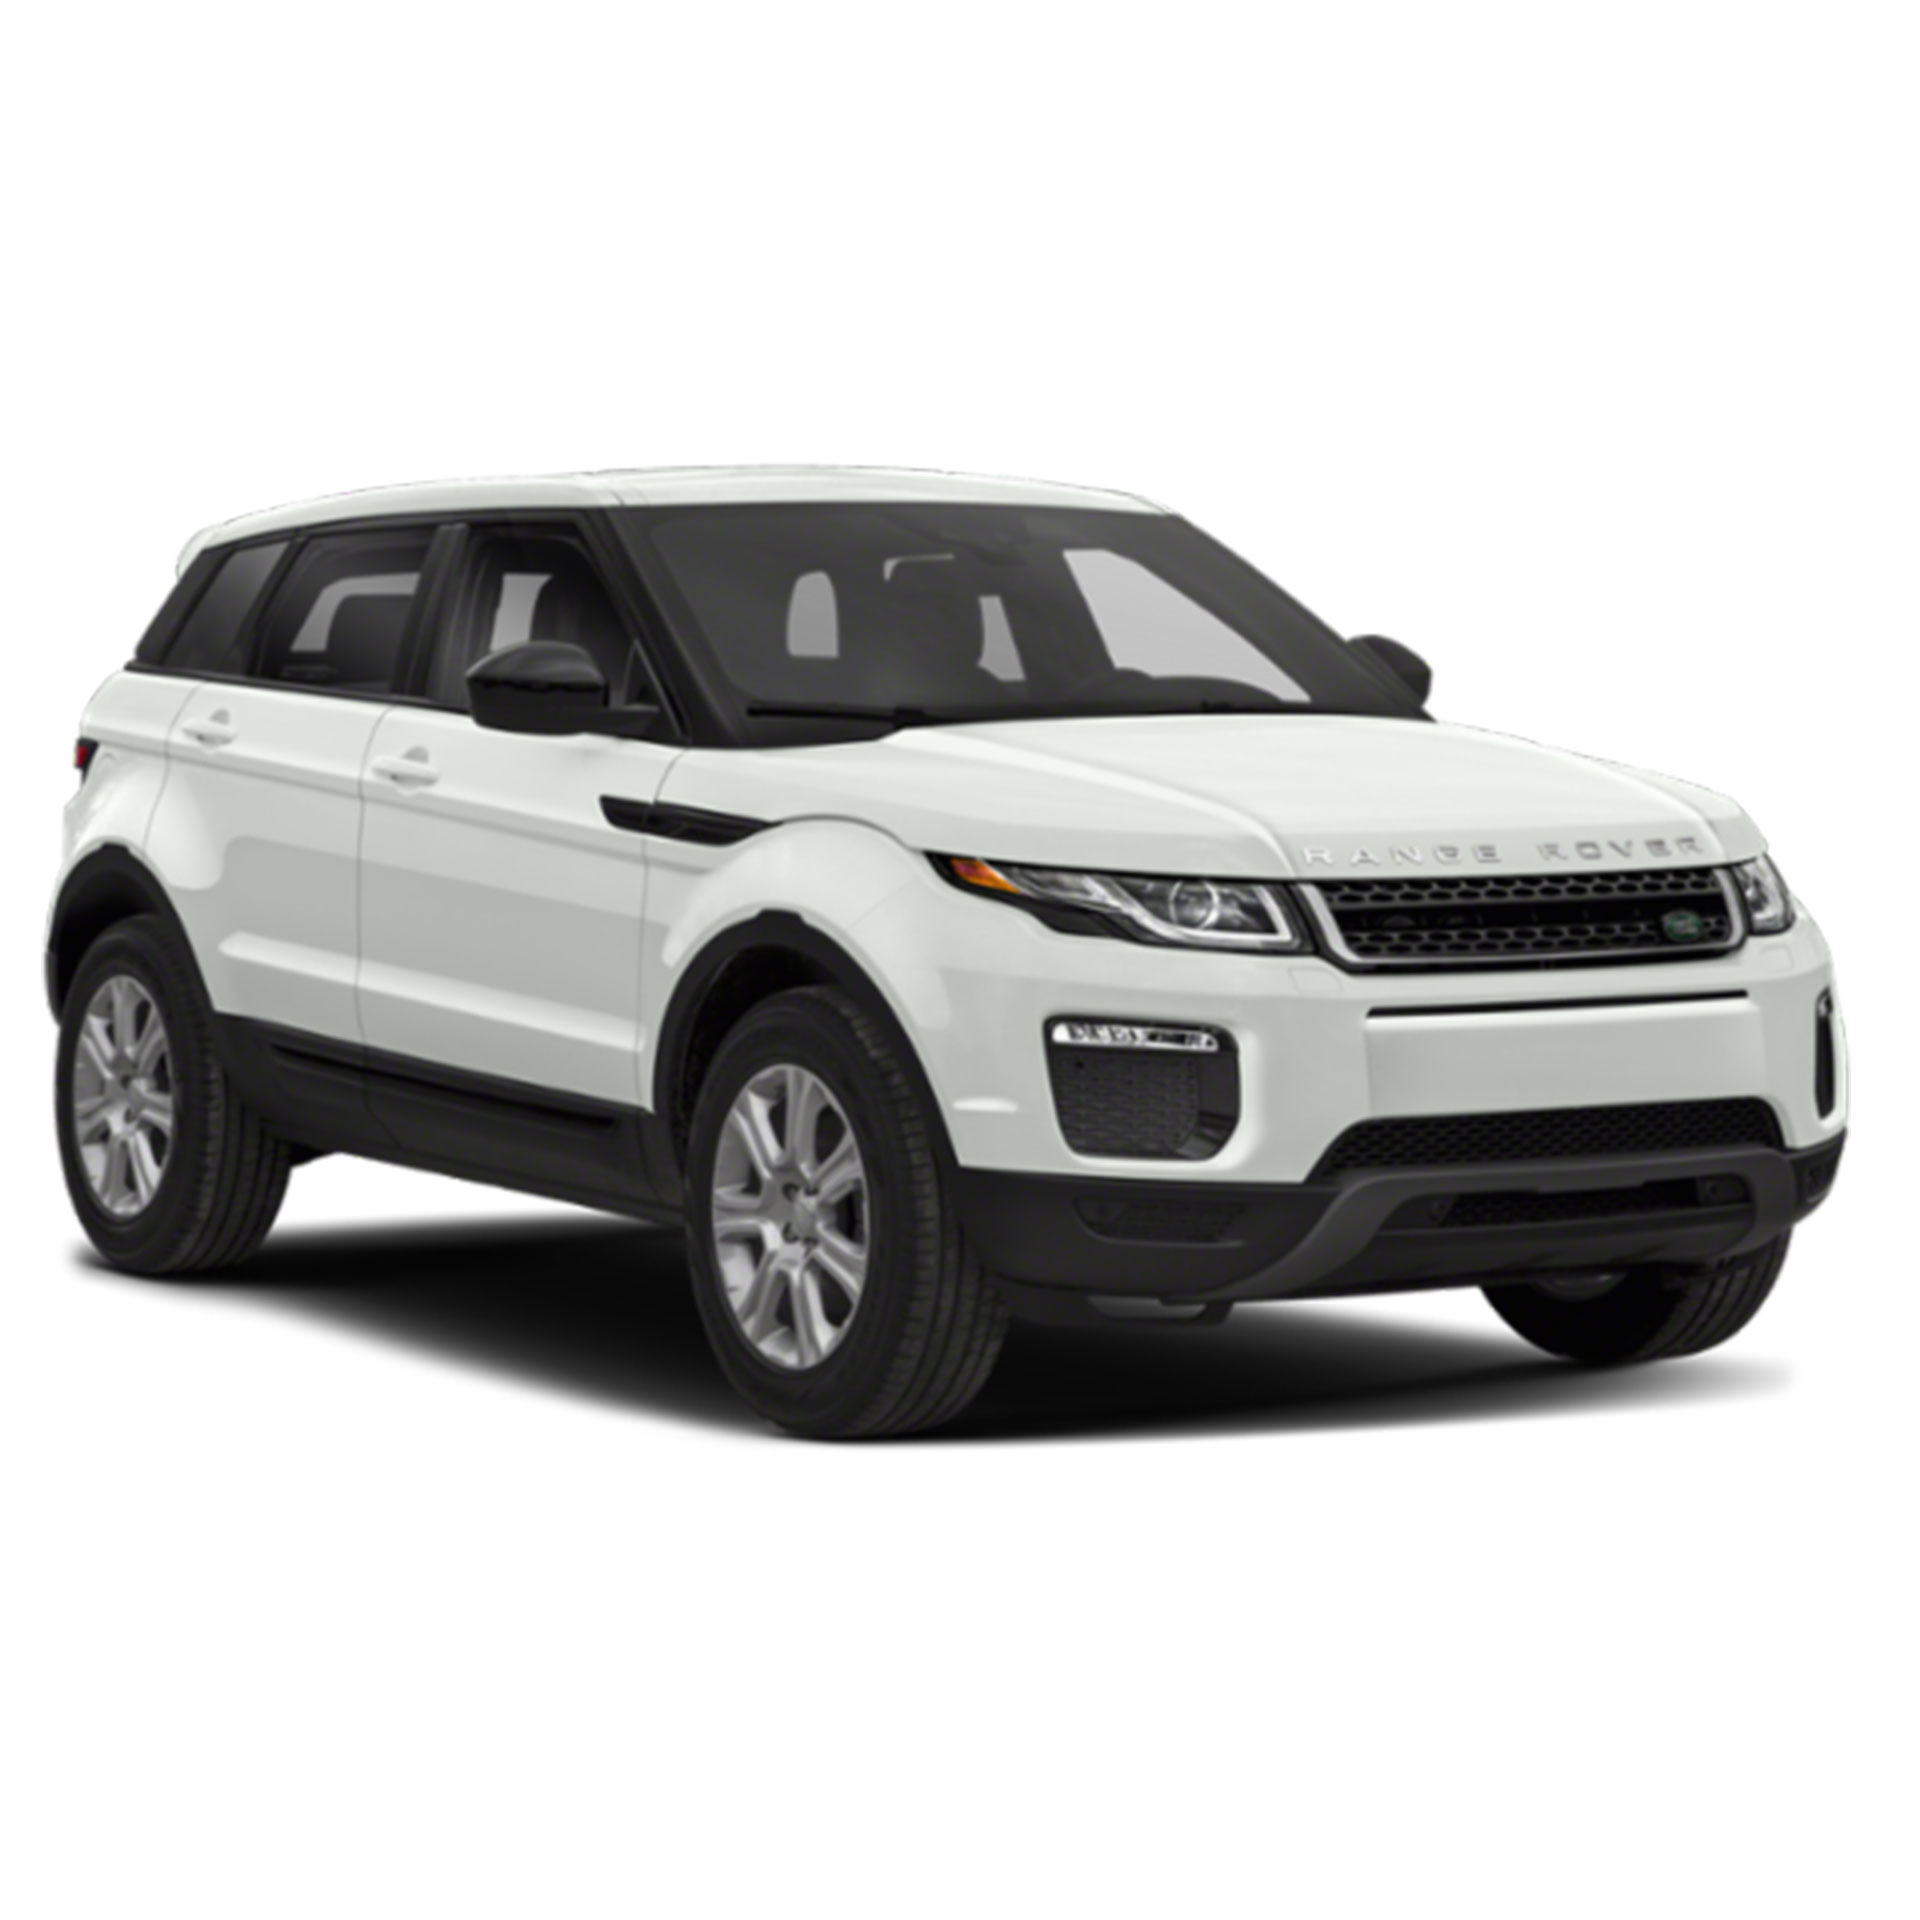 Land Rover Range Rover Evoque Boot Liner (2018 Onwards)